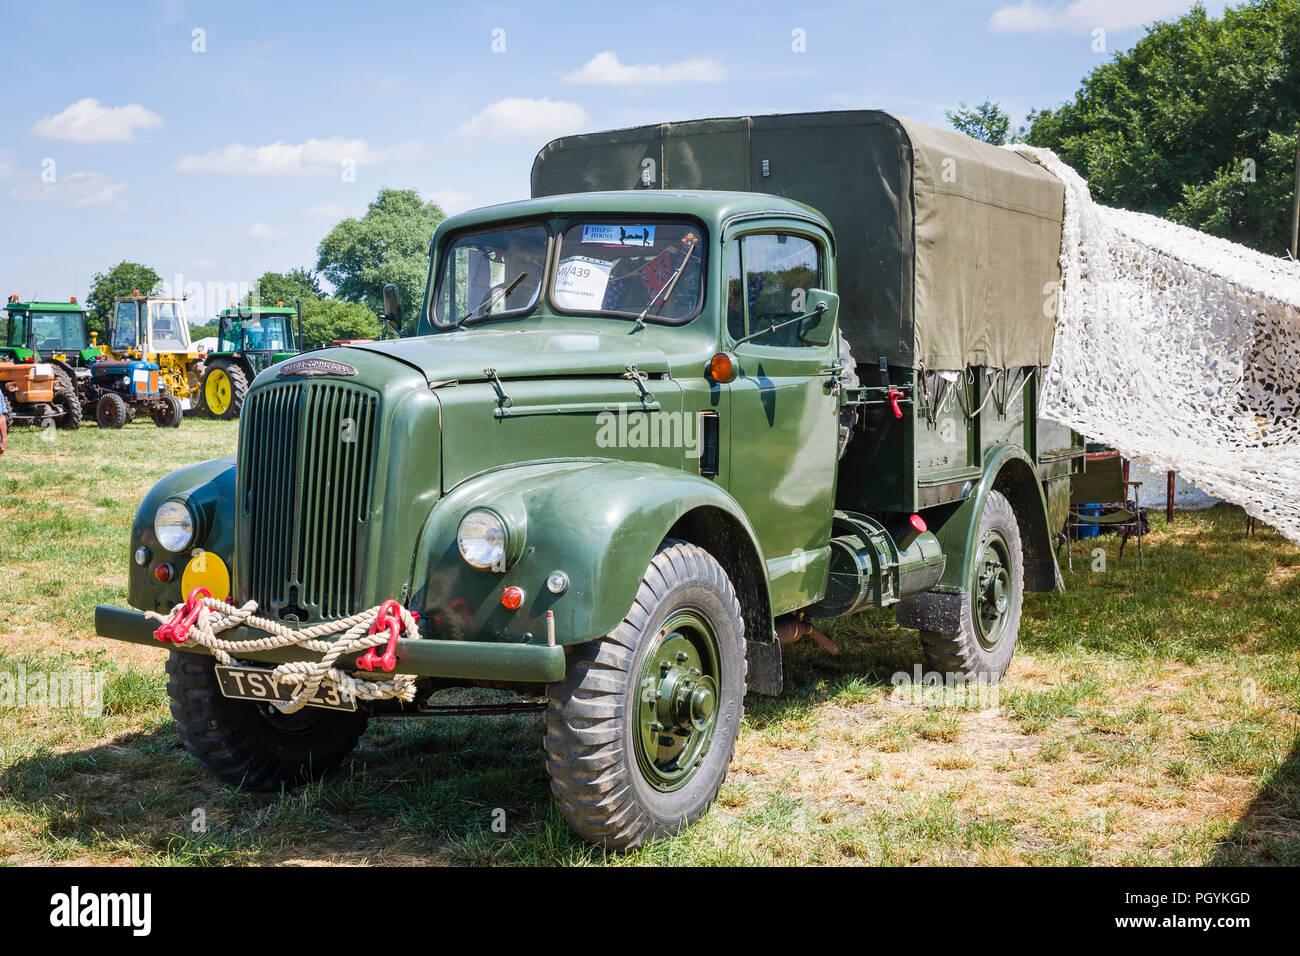 Military Vehicle Stock Photos & Military Vehicle Stock